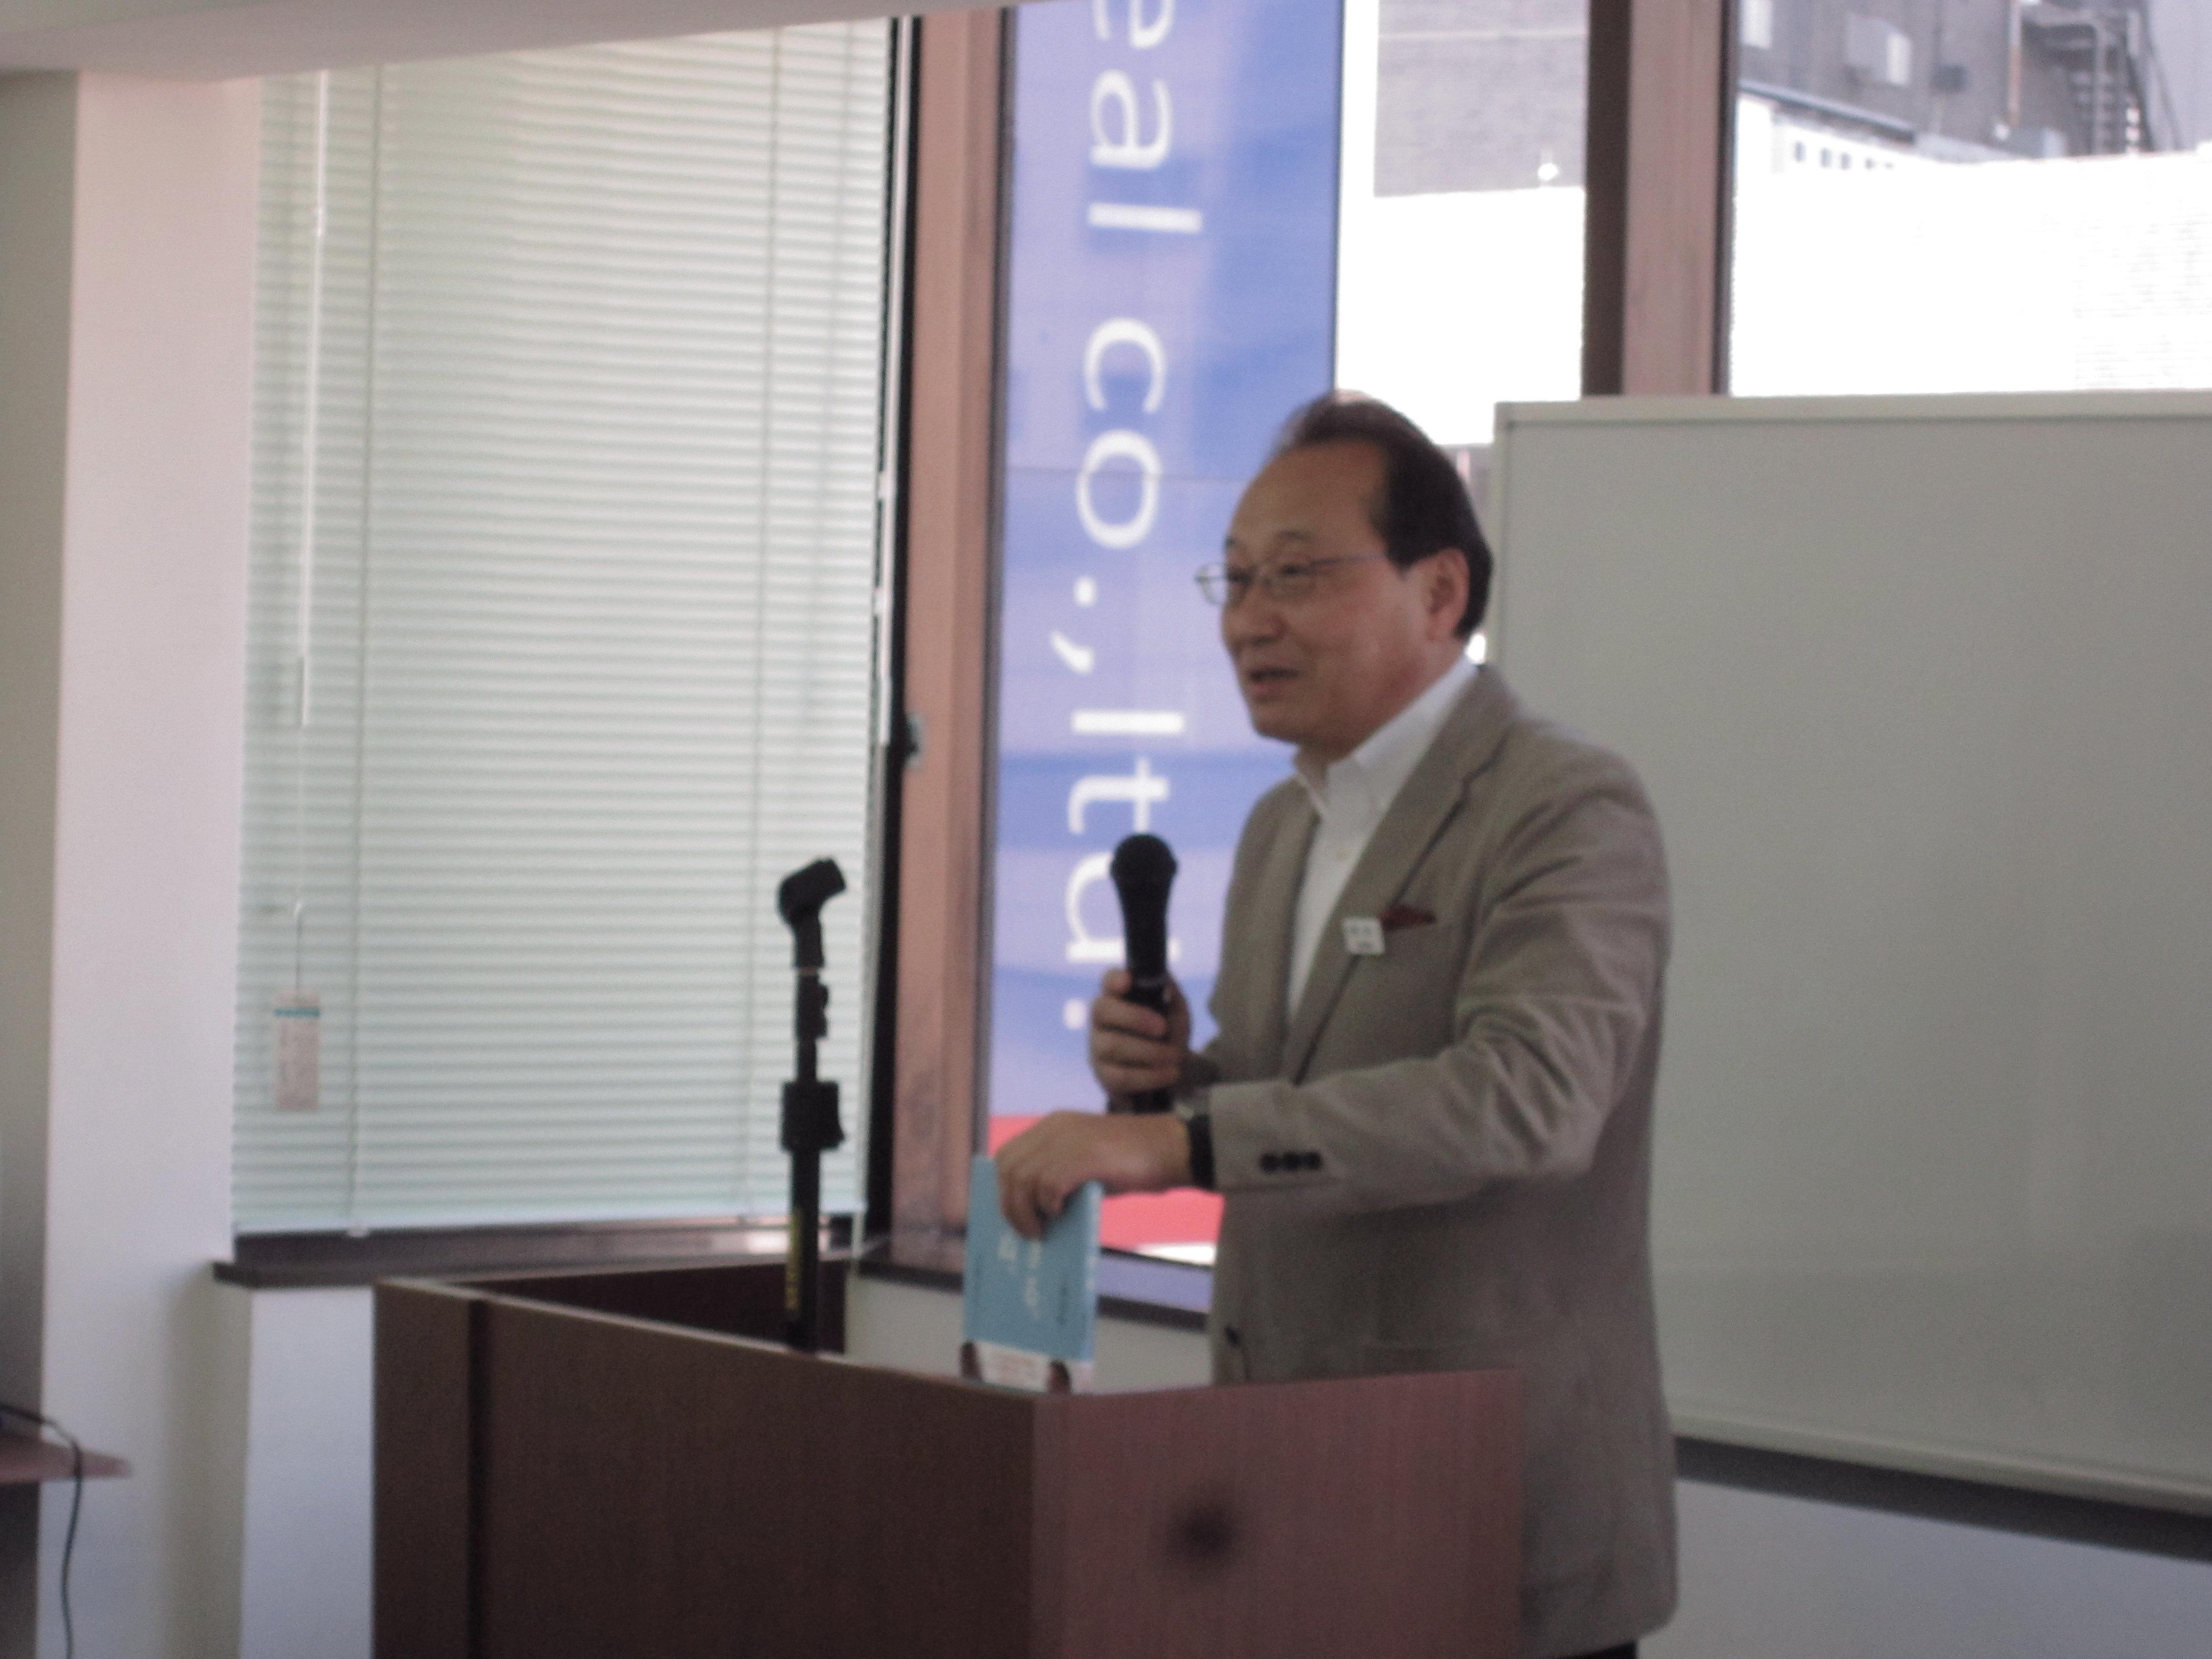 IMG 5588 - 4月1日東京思風塾の開催になります。